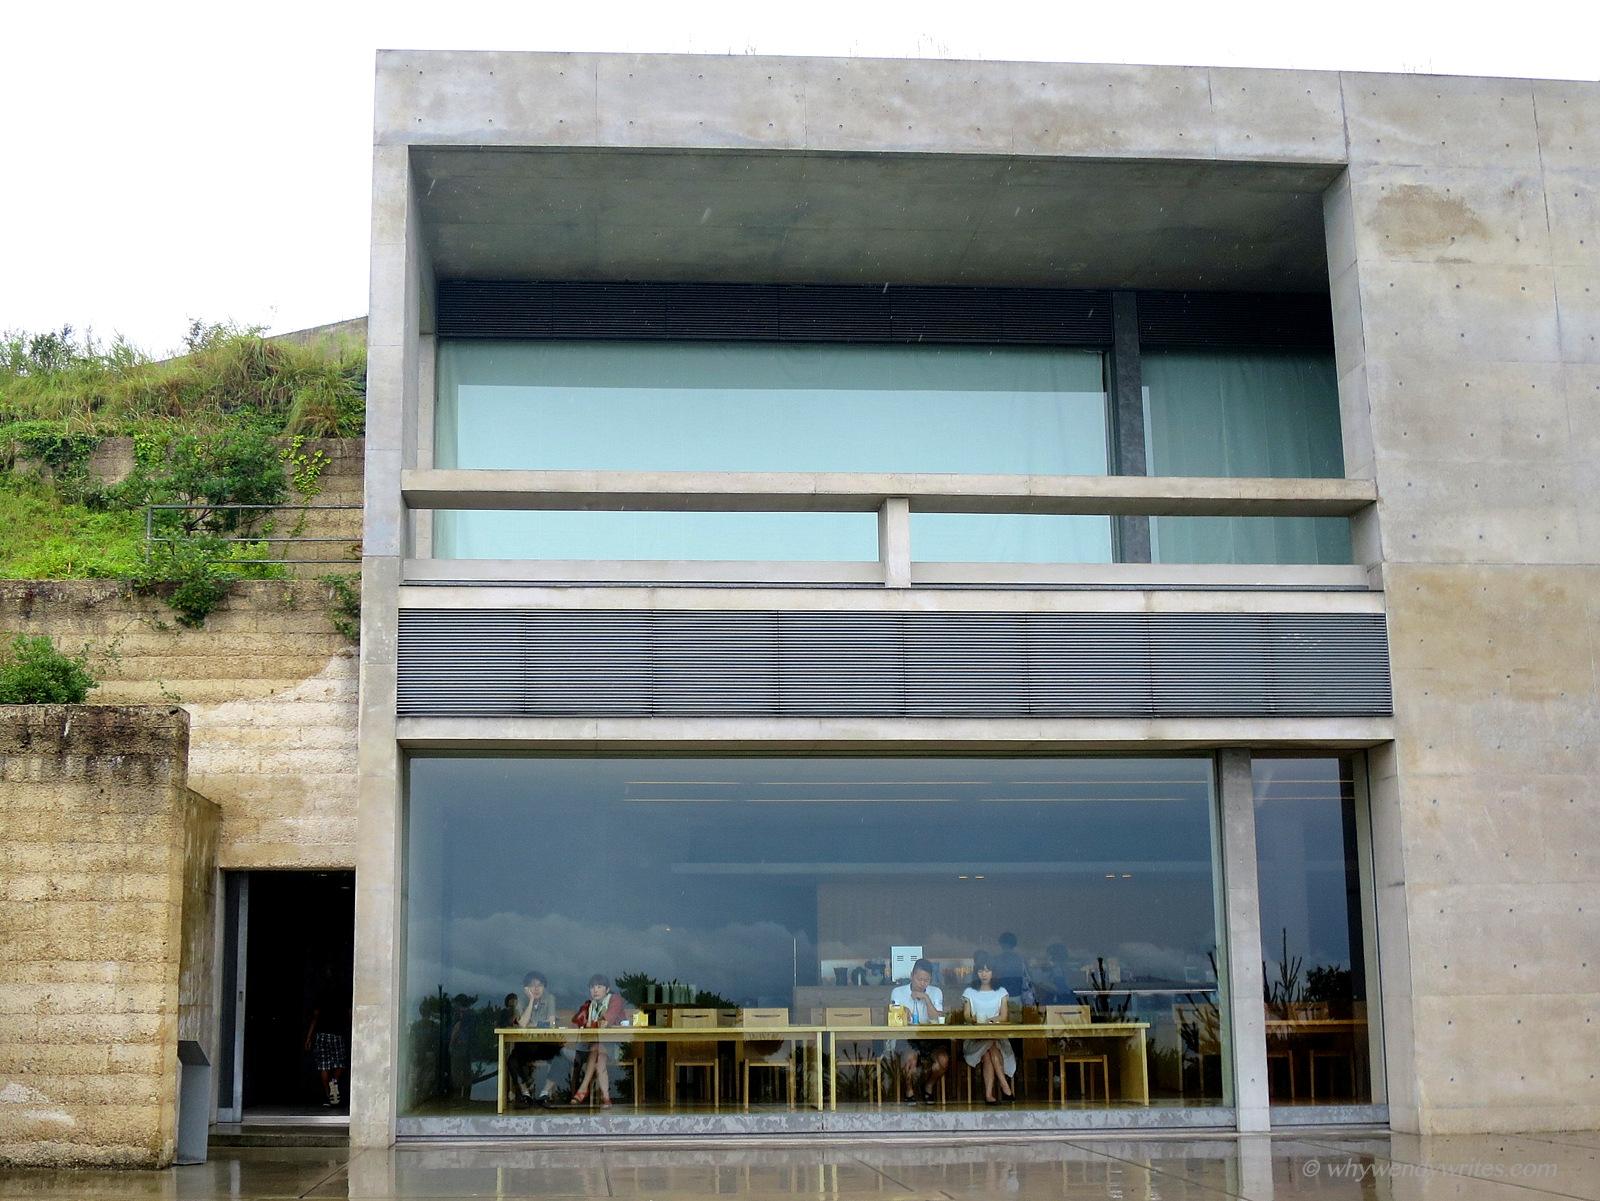 Chichu Art Museum's Chichu Café